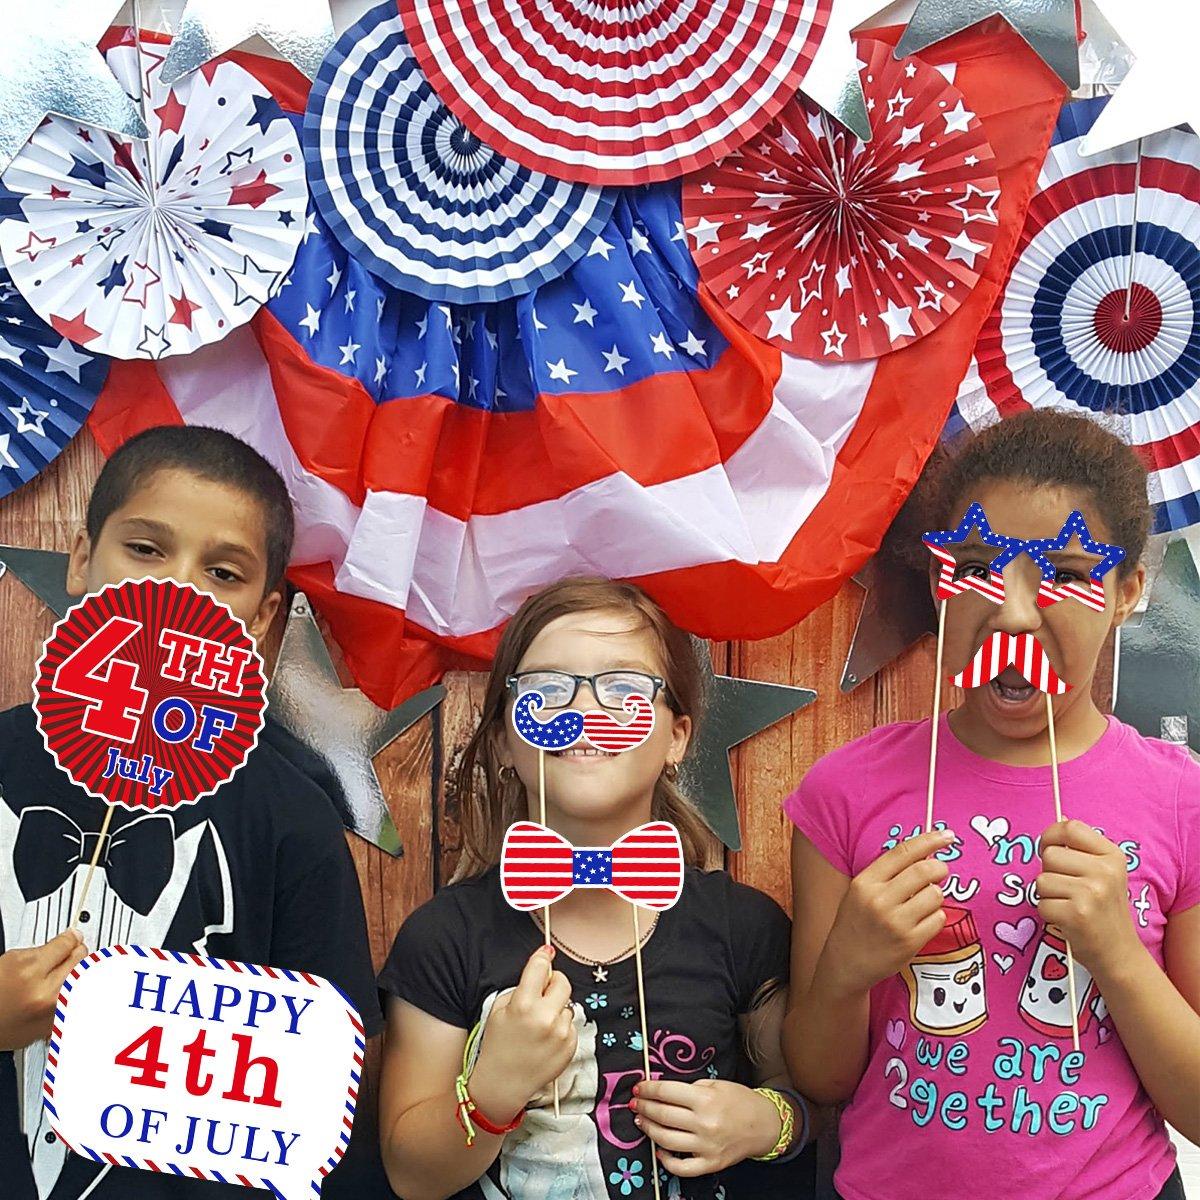 BESTOYARD 12 st/ücke Kreative Geburtstag Photo Booth Streifen Party Fotografie Kits Dress Up Party Dekoration